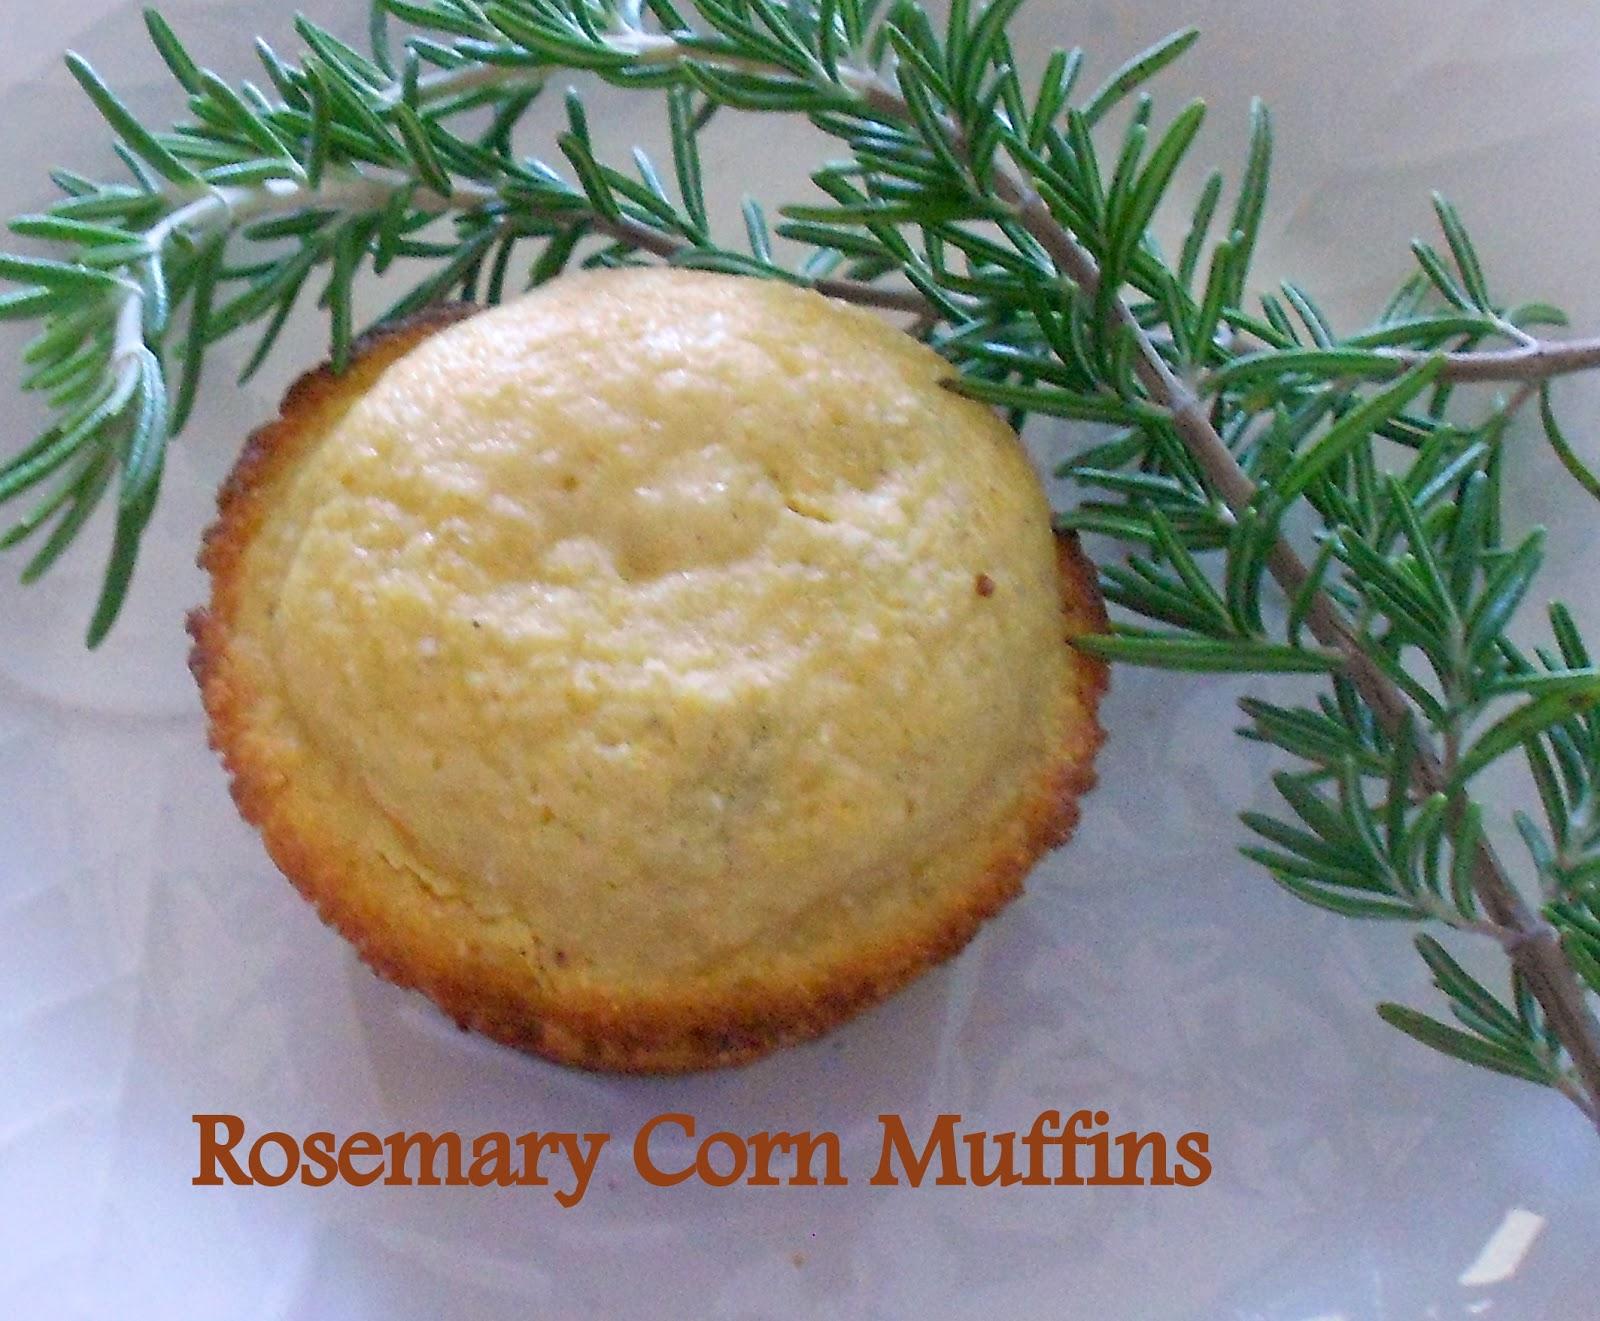 muffin recipe two peas cheddar rosemary corn muffins cheddar corn ...